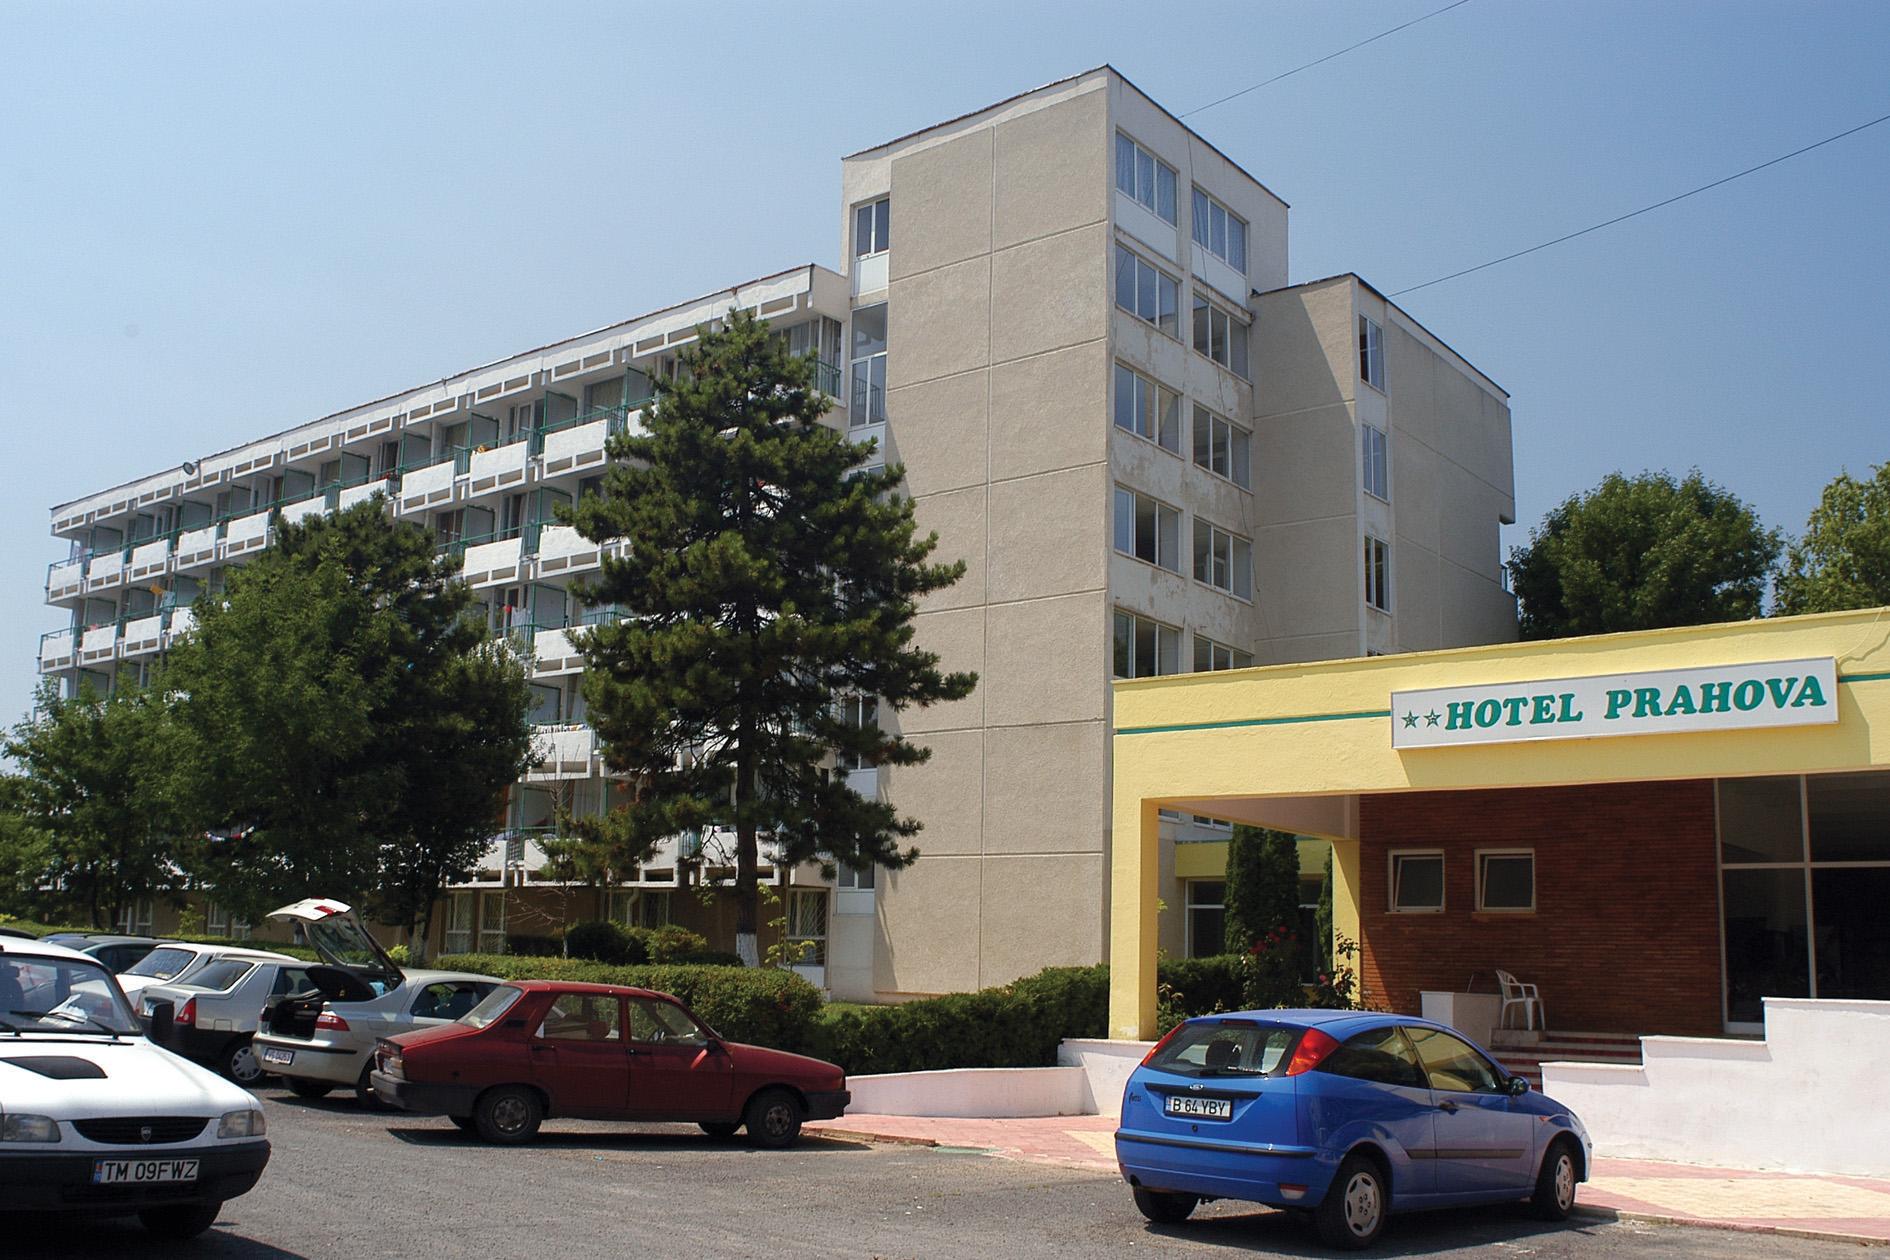 cazare la Hotel Prahova